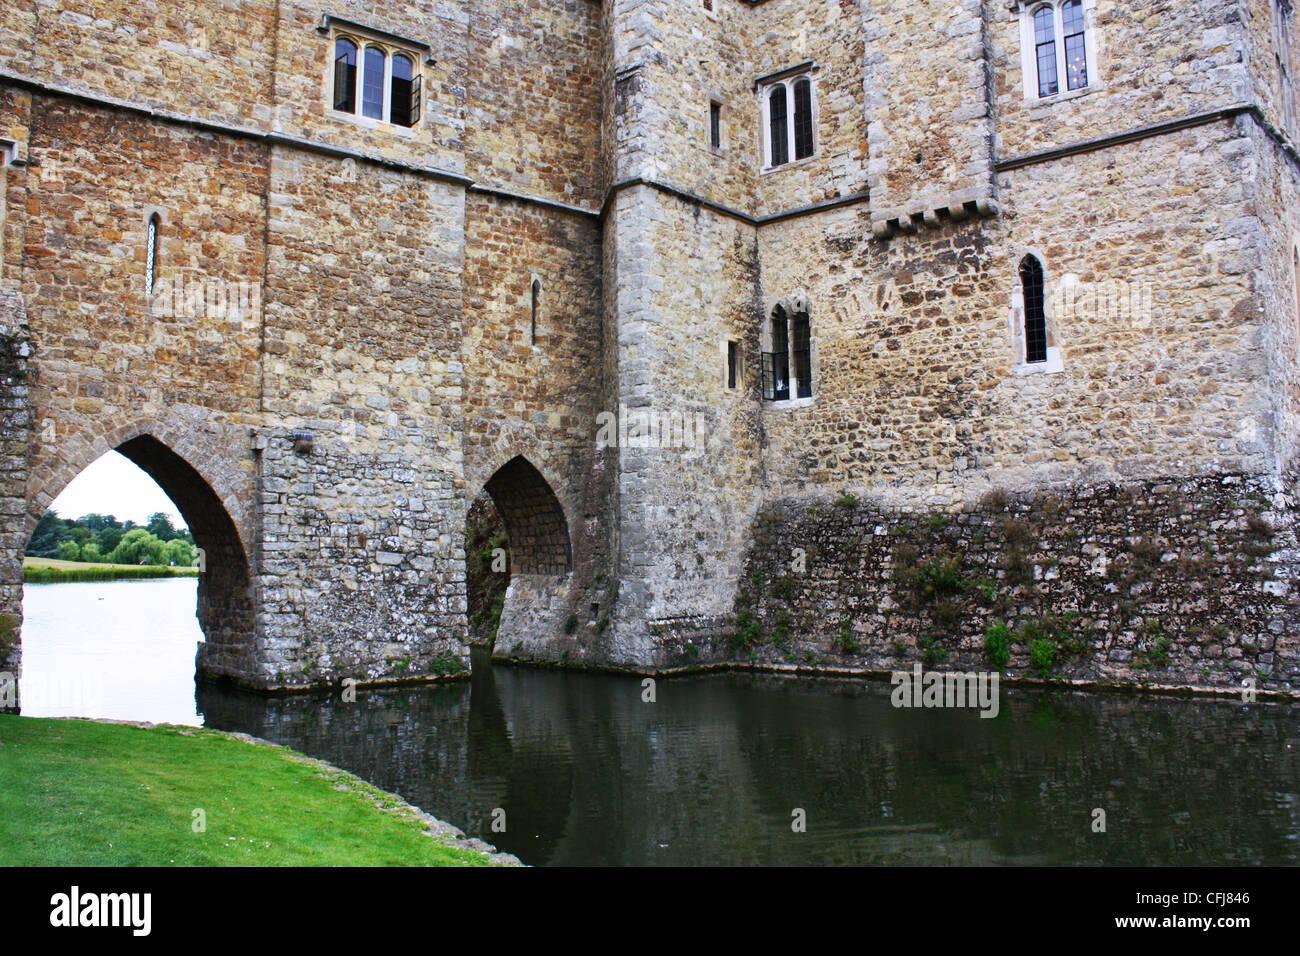 Leeds castle in United Kingdom Stock Photo